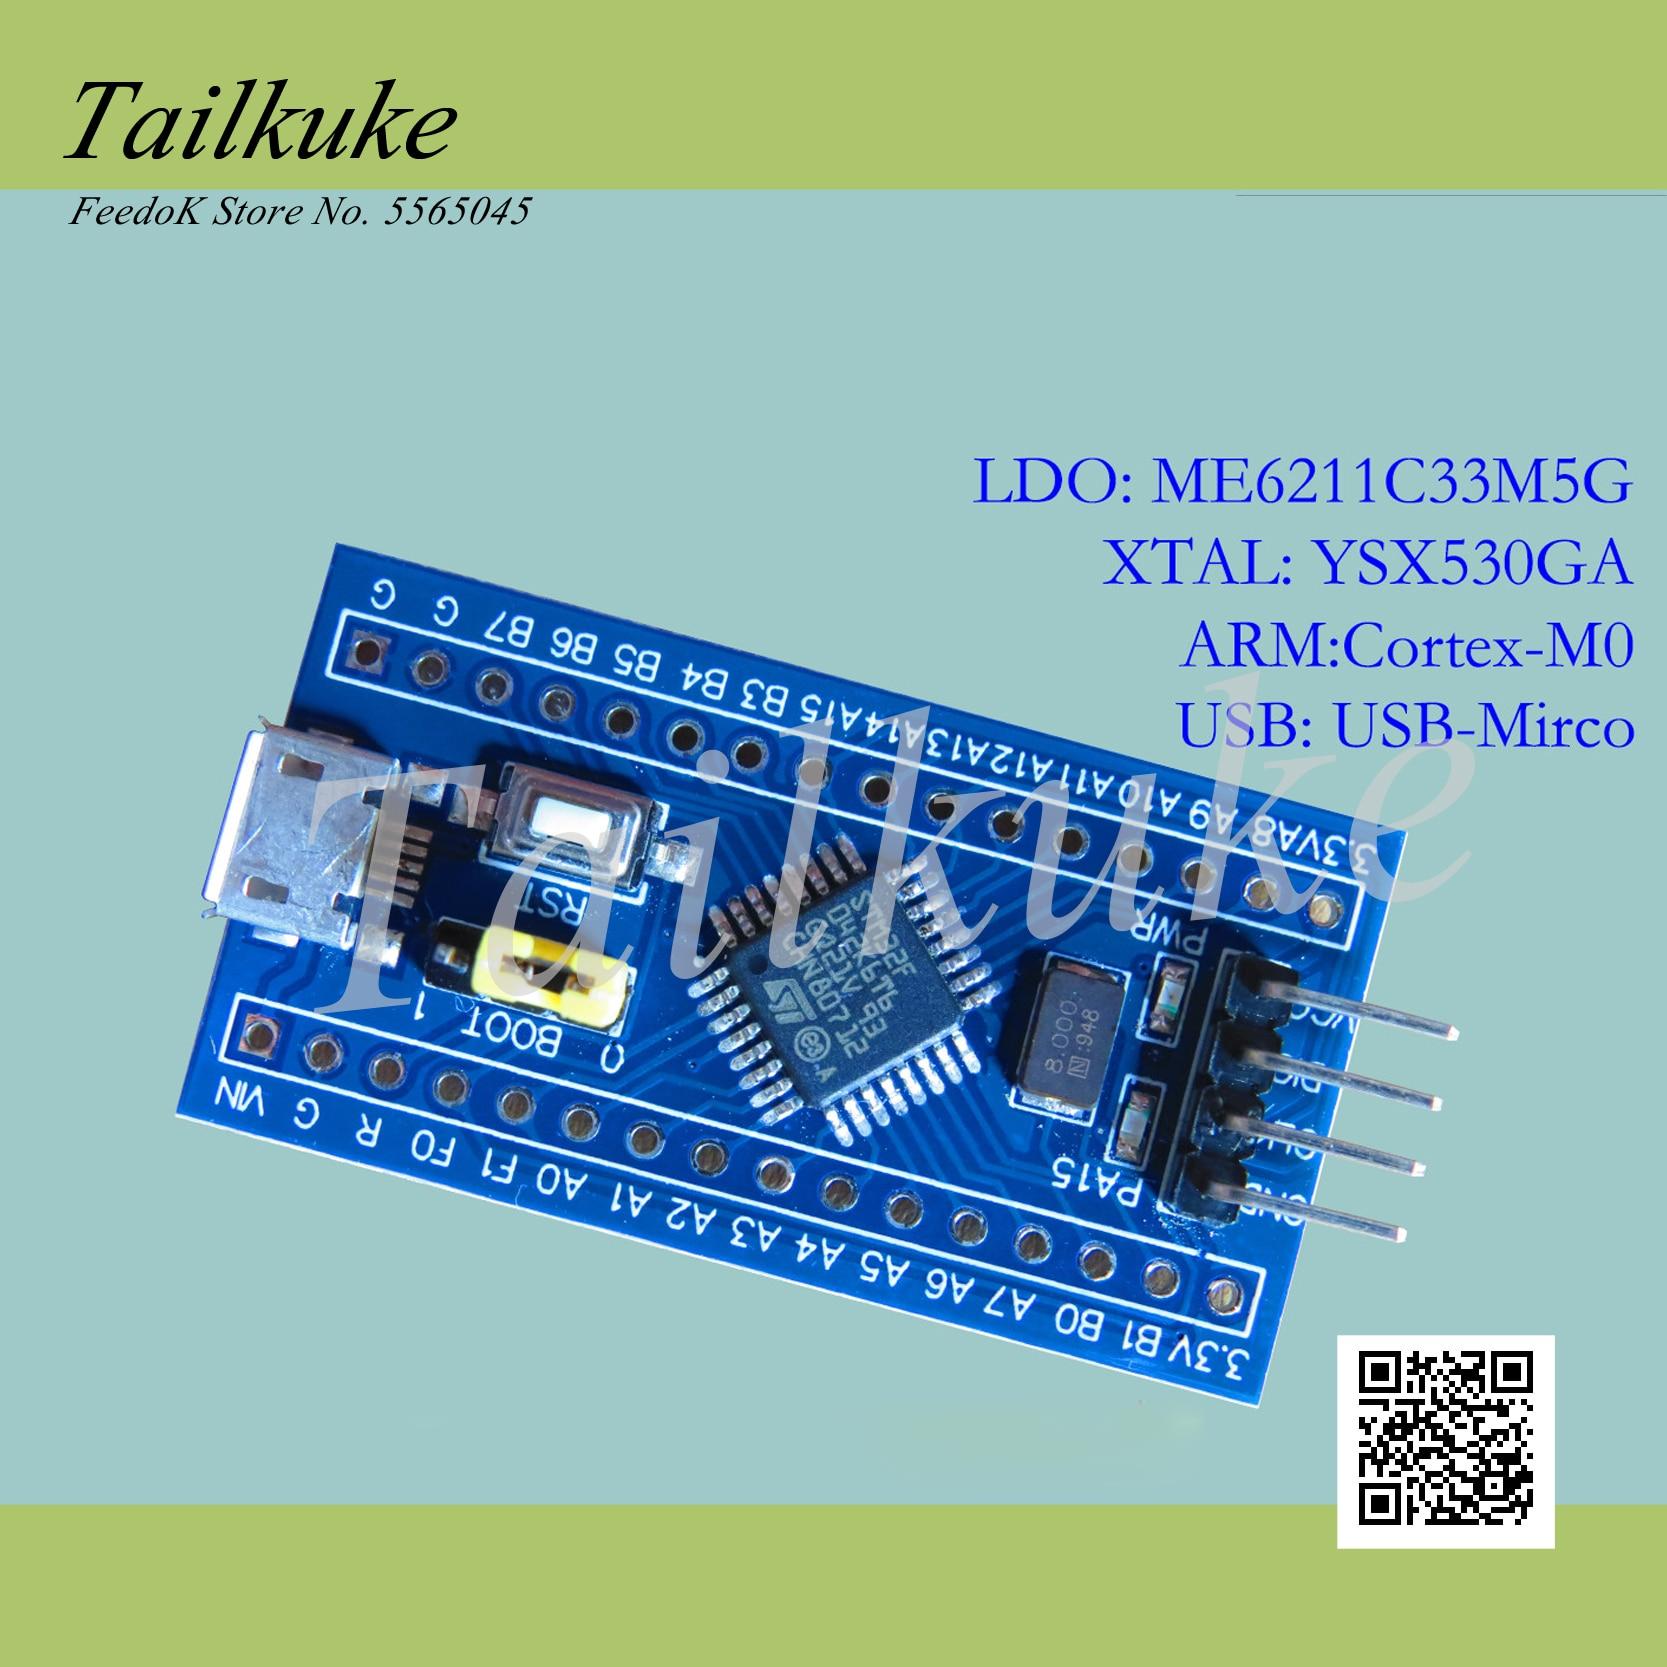 Stm32f042 Minimum System Stm32f042k6t6 Promotion Core Board Cortex-m0 Development Board M0 Elegant Shape